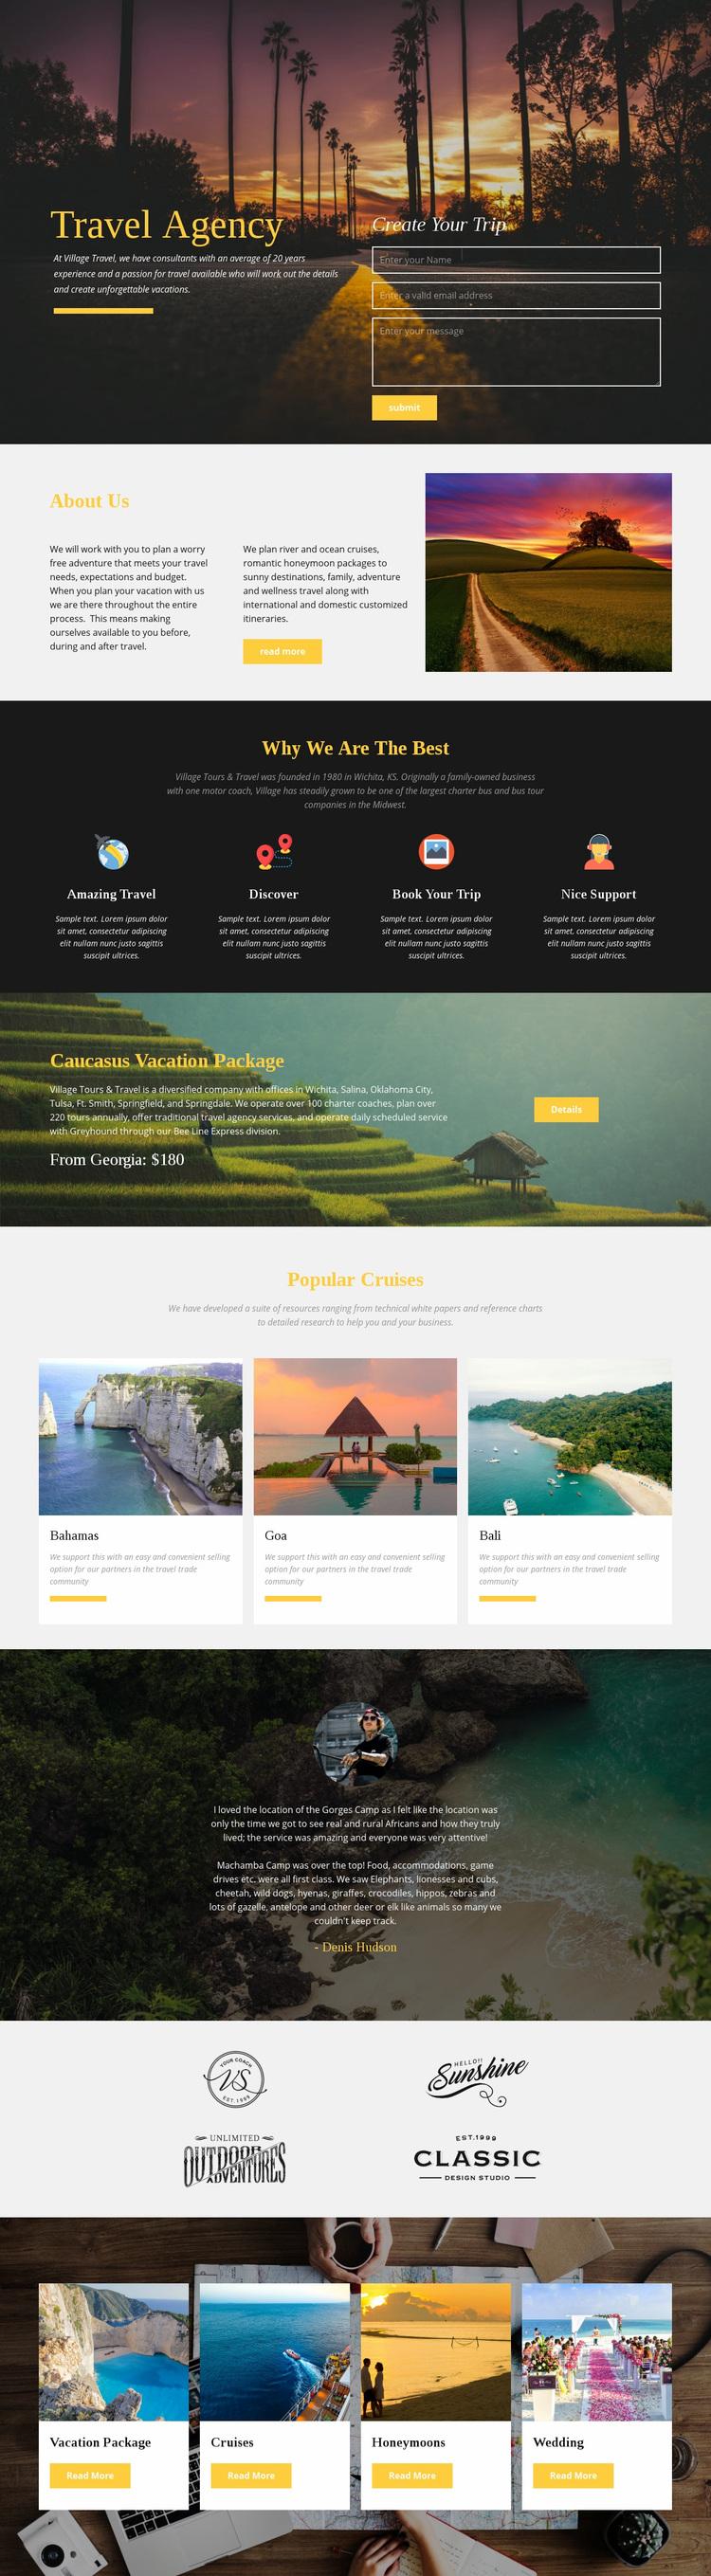 African safari tour company Web Page Designer